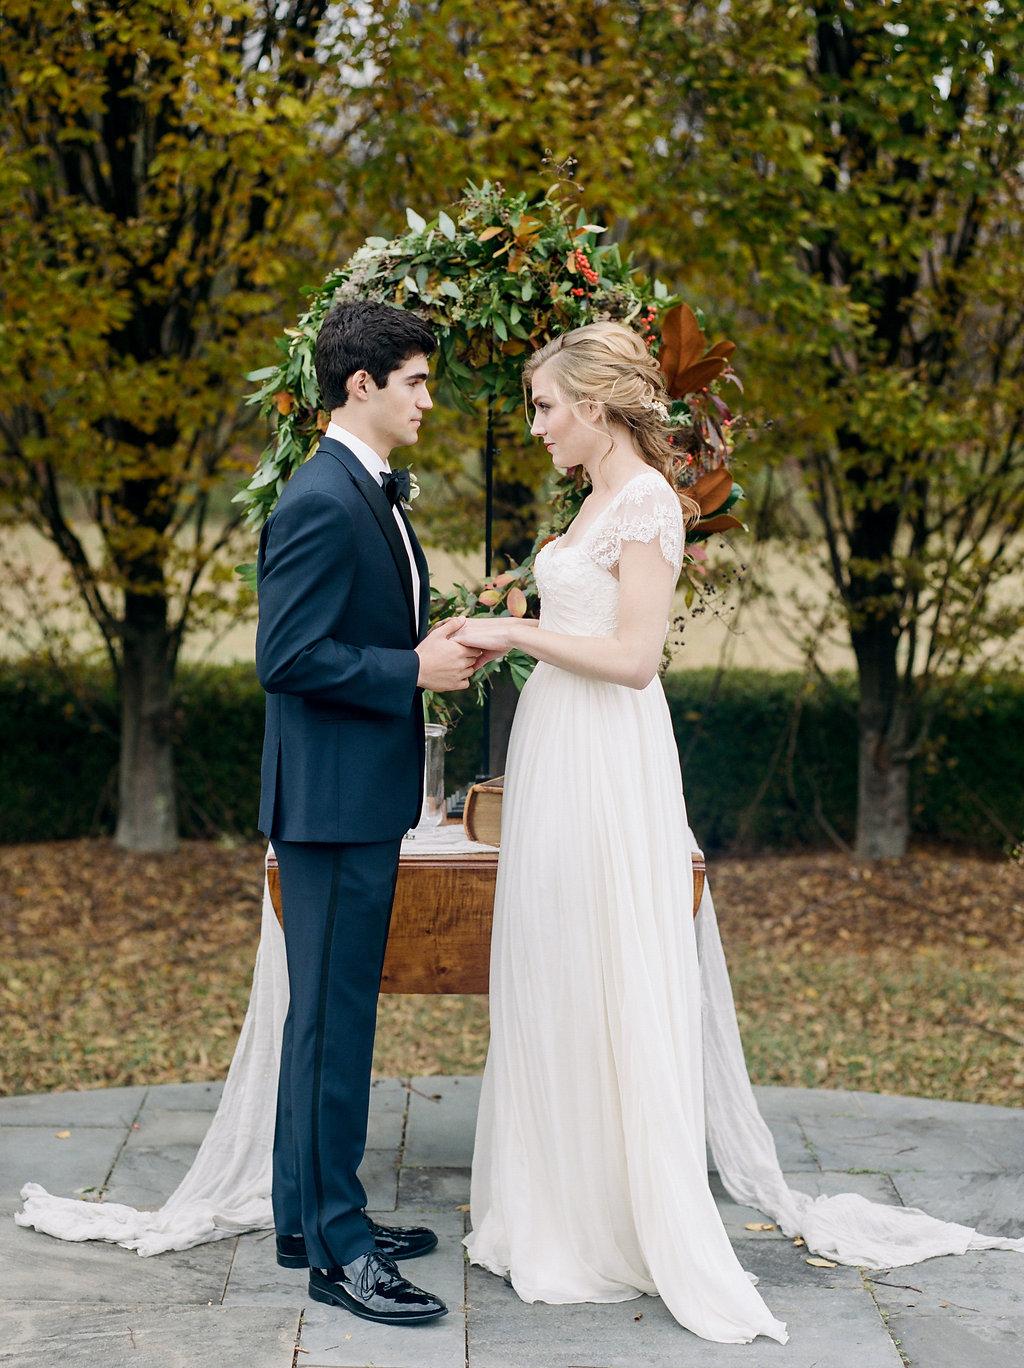 wedding ceremonies - photo by Lissa Ryan Photography http://ruffledblog.com/modern-romantic-wedding-ideas-with-family-heirlooms